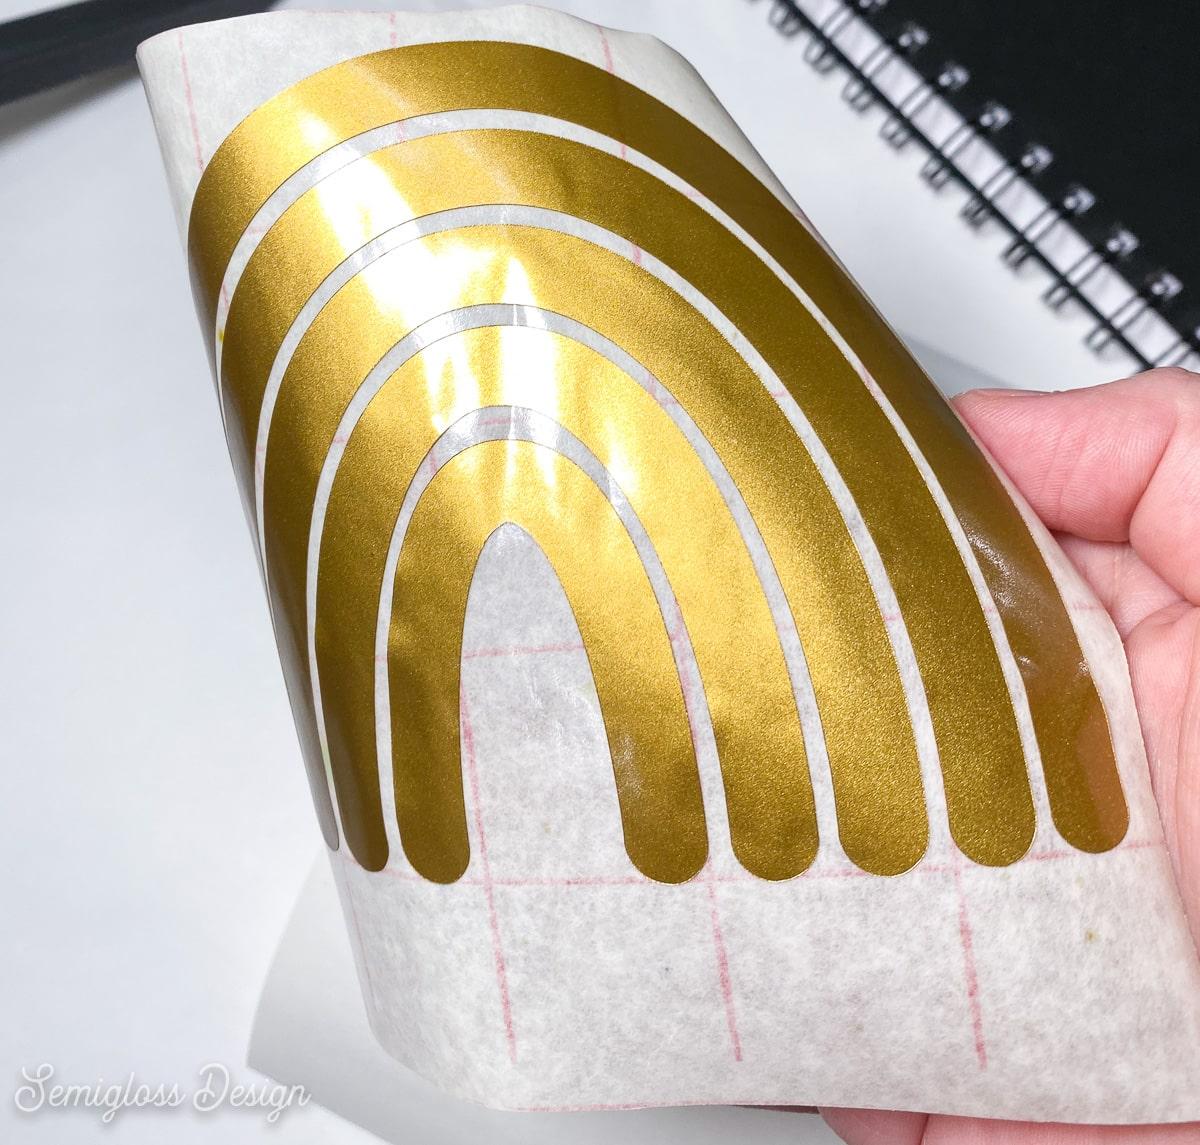 vinyl design adhered to transfer tape